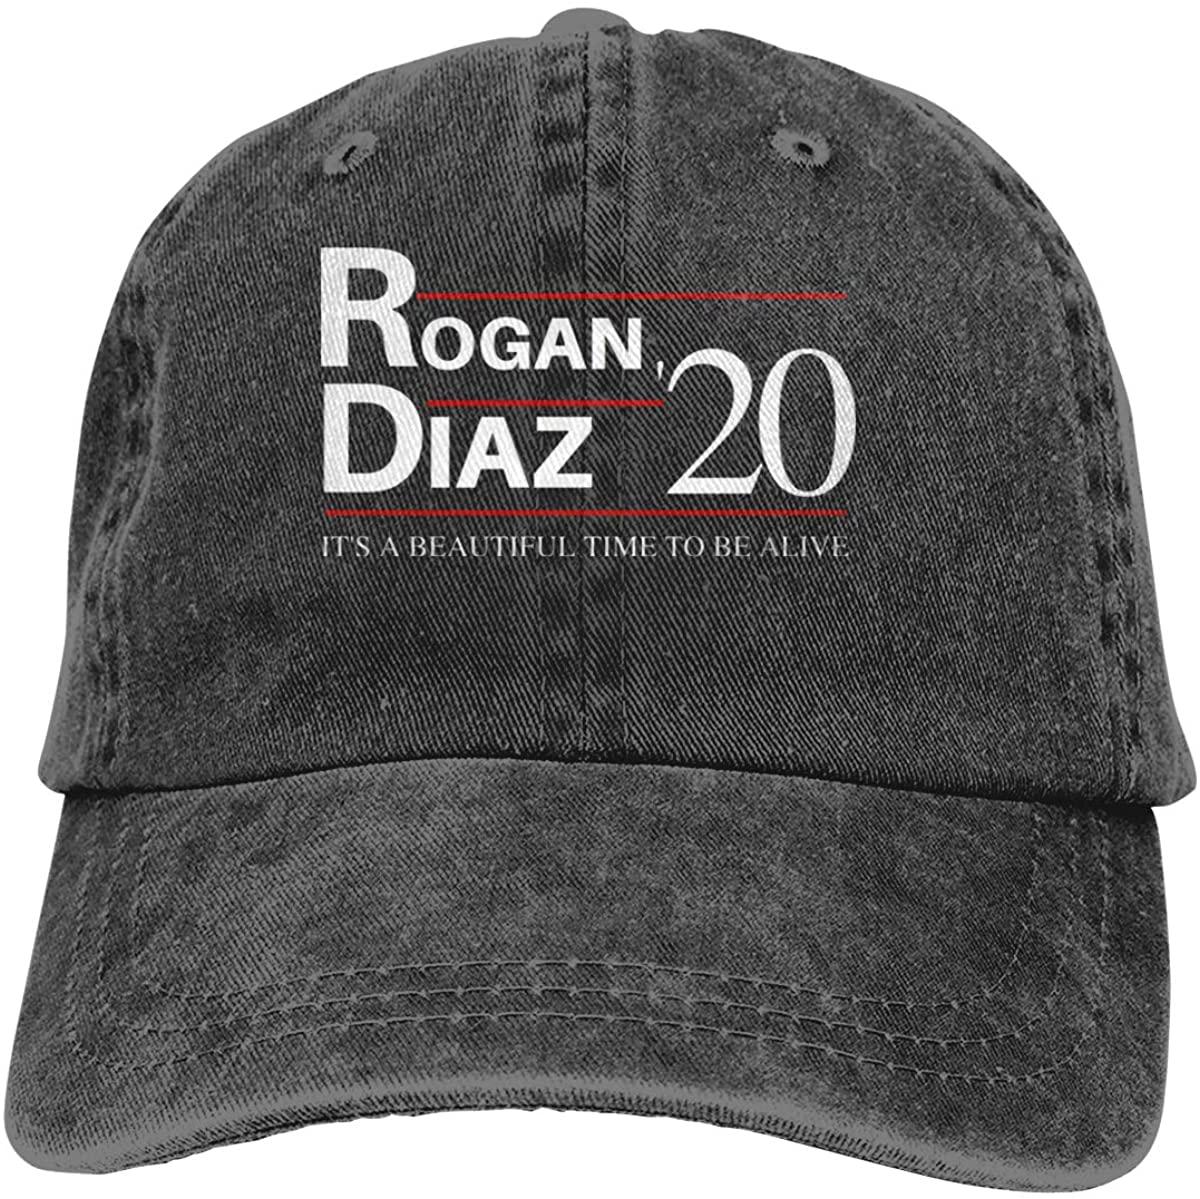 GOOANGUS Joe Rogan Joey Diaz 2020 Adjustable Unisex Hat Baseball Caps Black